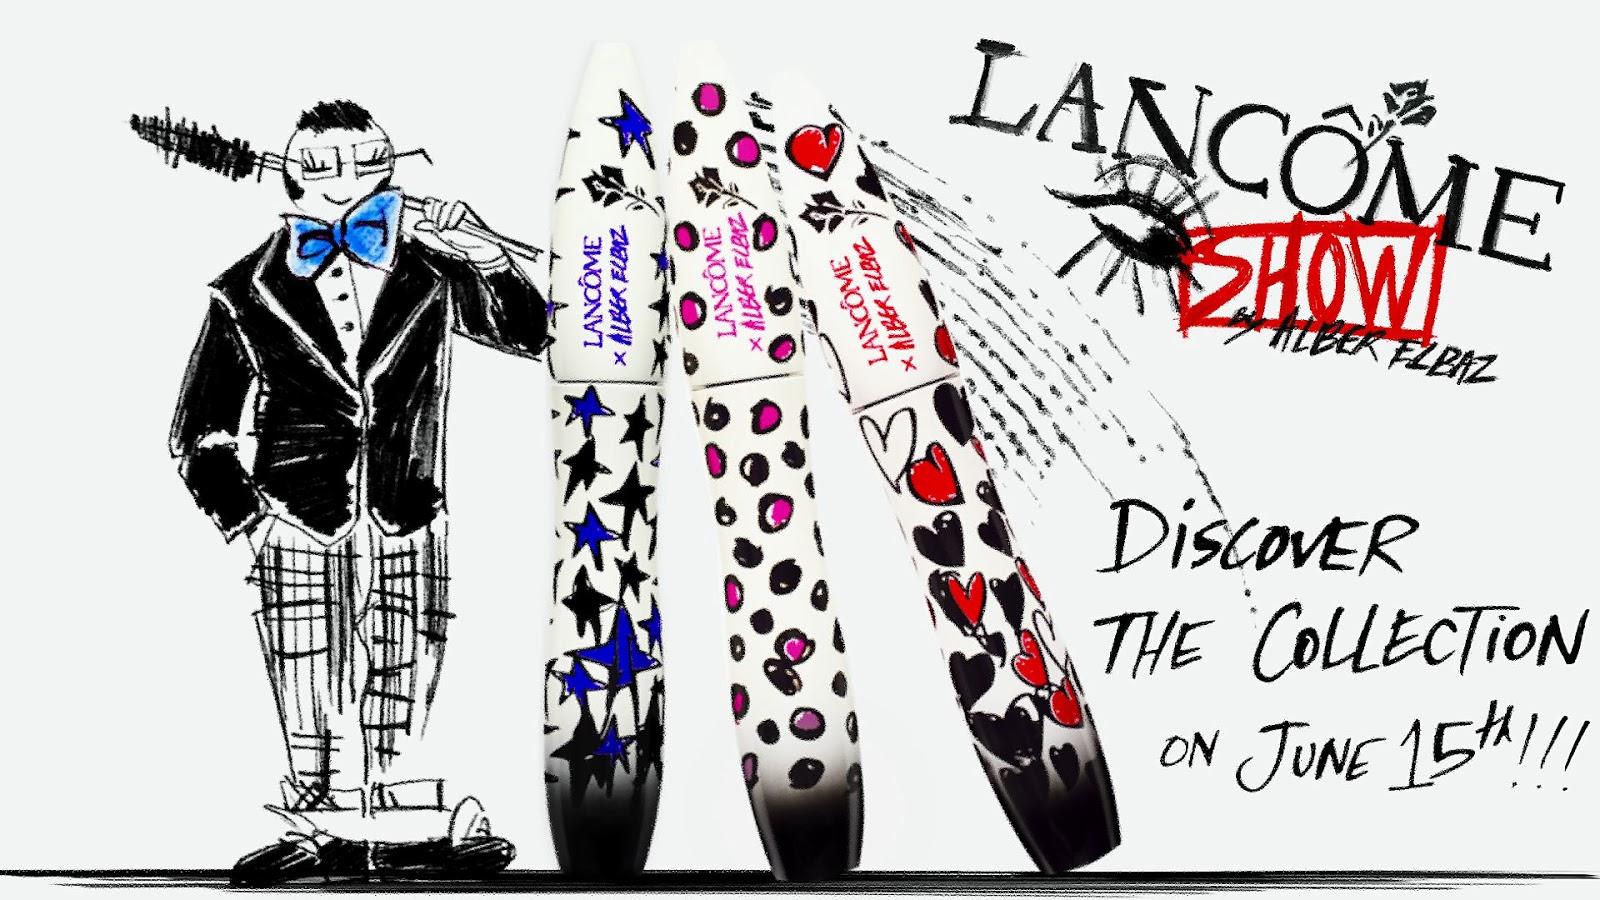 """Hypnôse show"" : Alber Elbaz x Lancôme, starting today ..."